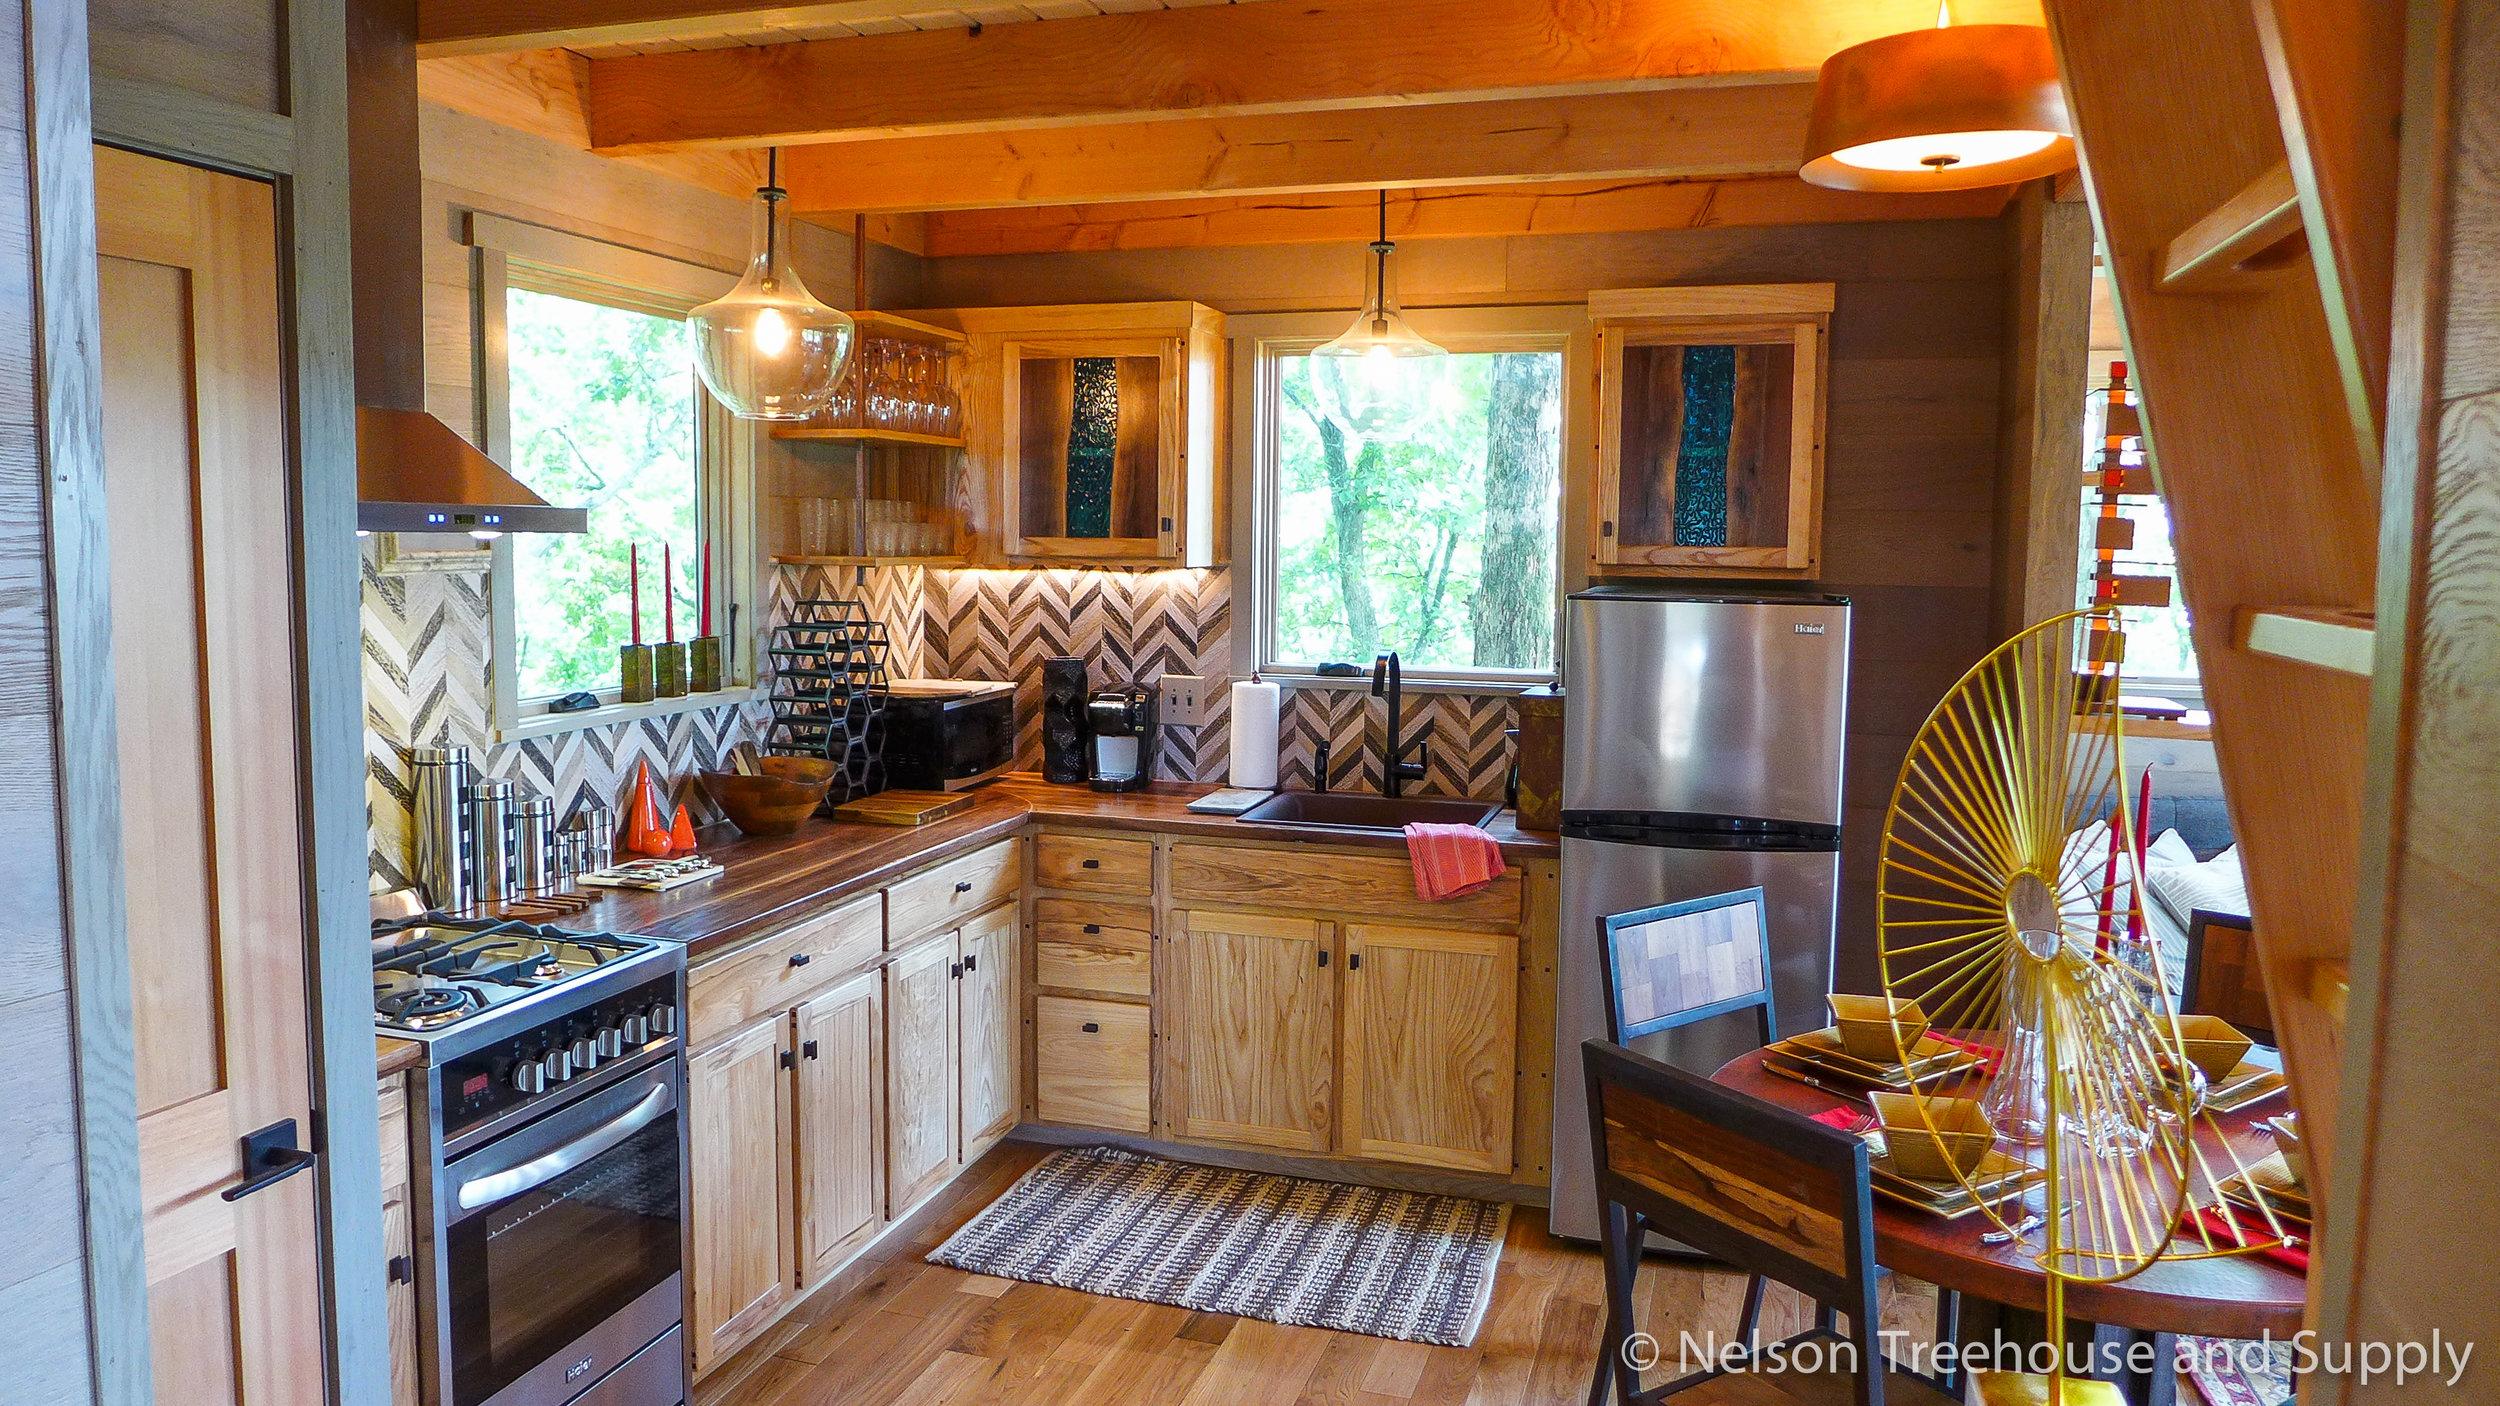 frank-lloyd-wright-treehouse-kitchen